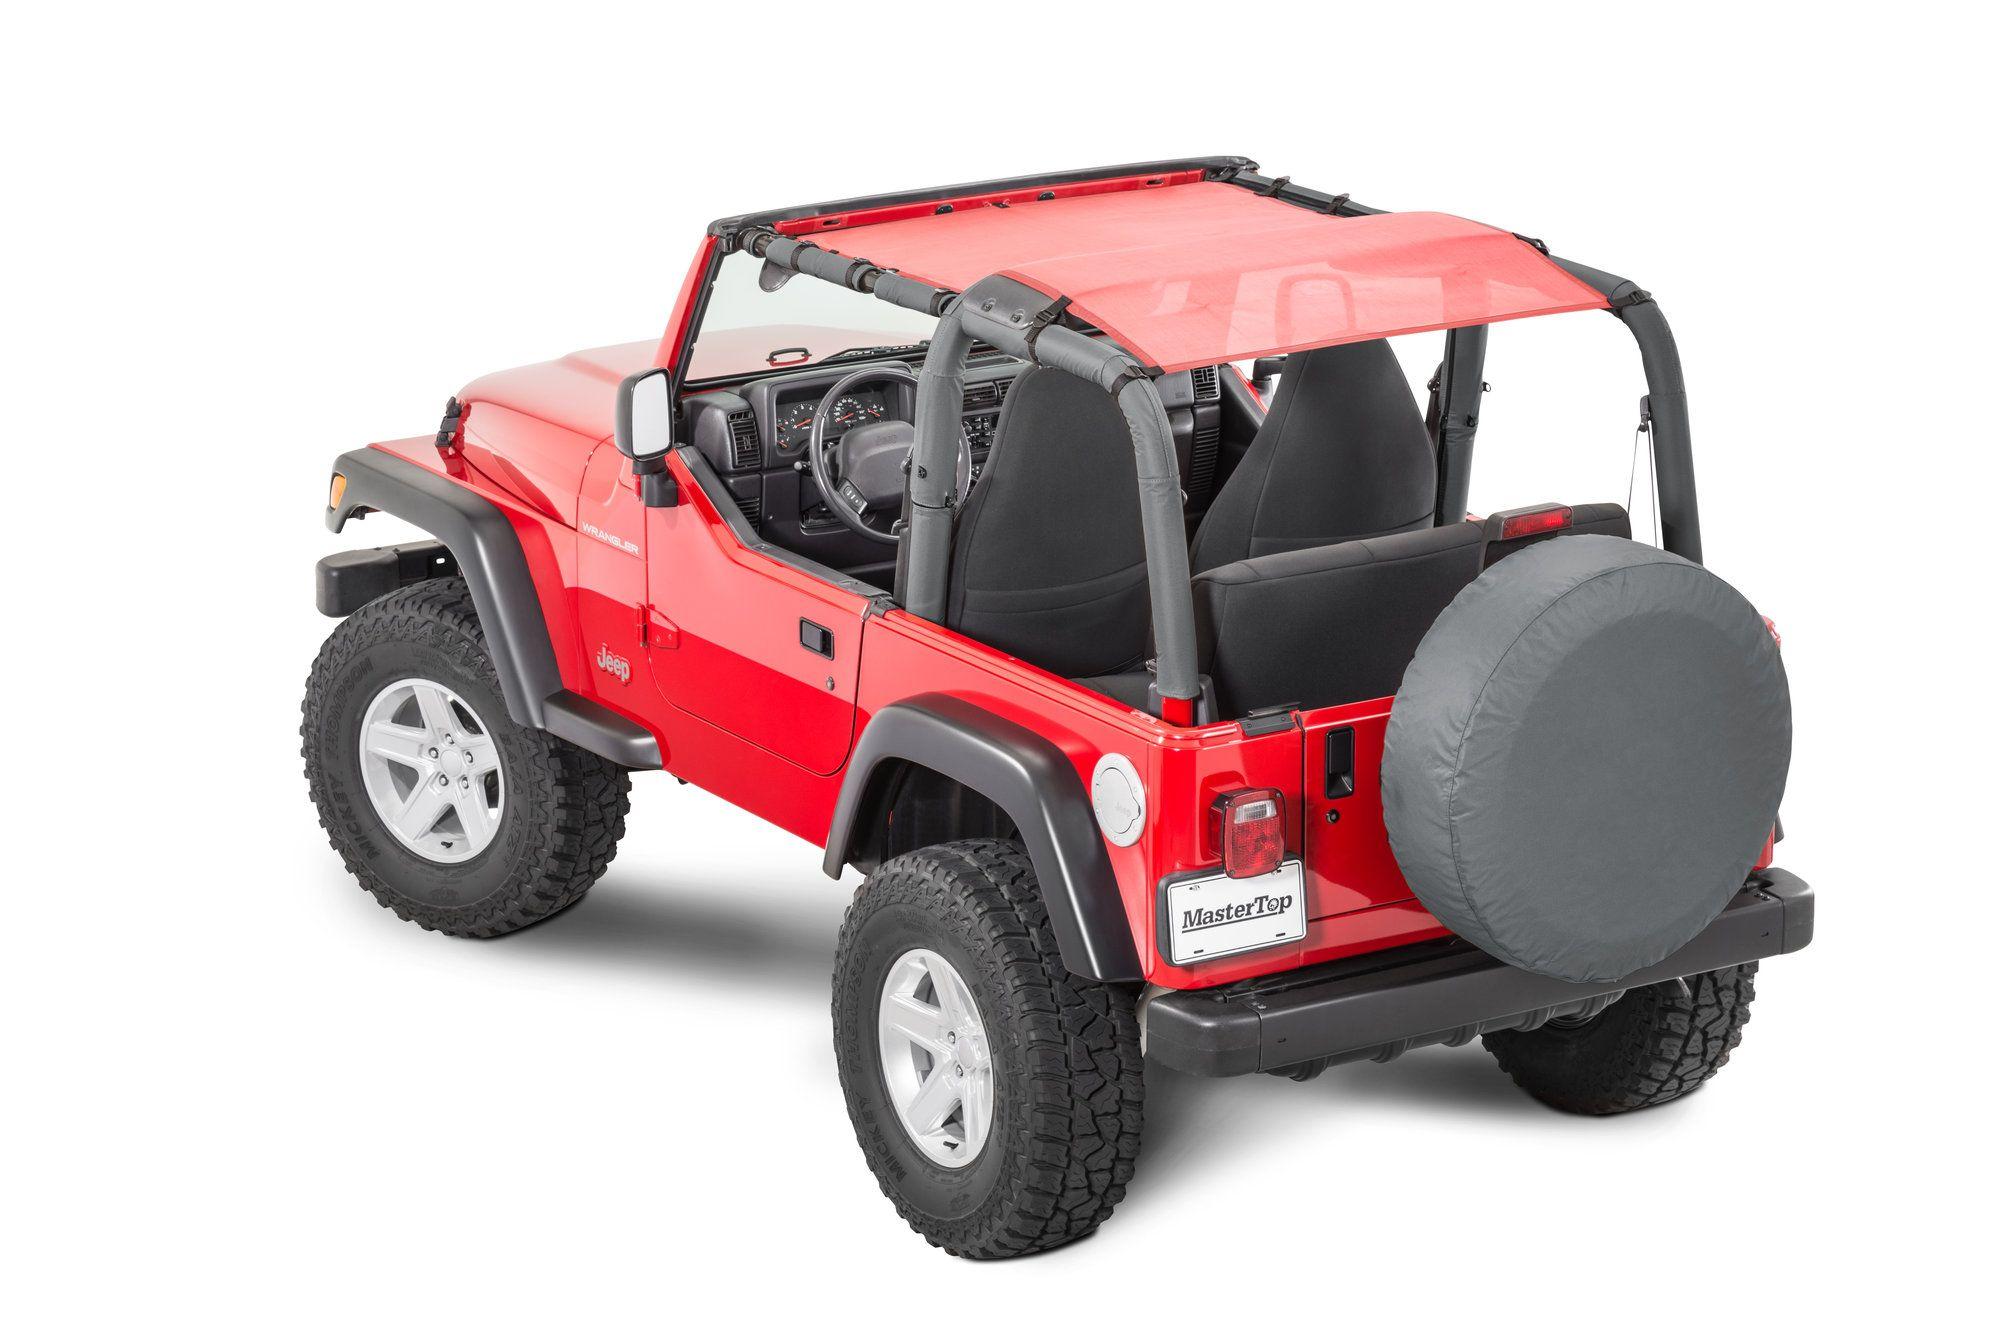 Jeep Bimini Top >> Mastertop Shademaker Bimini Top Plus For 92 06 Jeep Wrangler